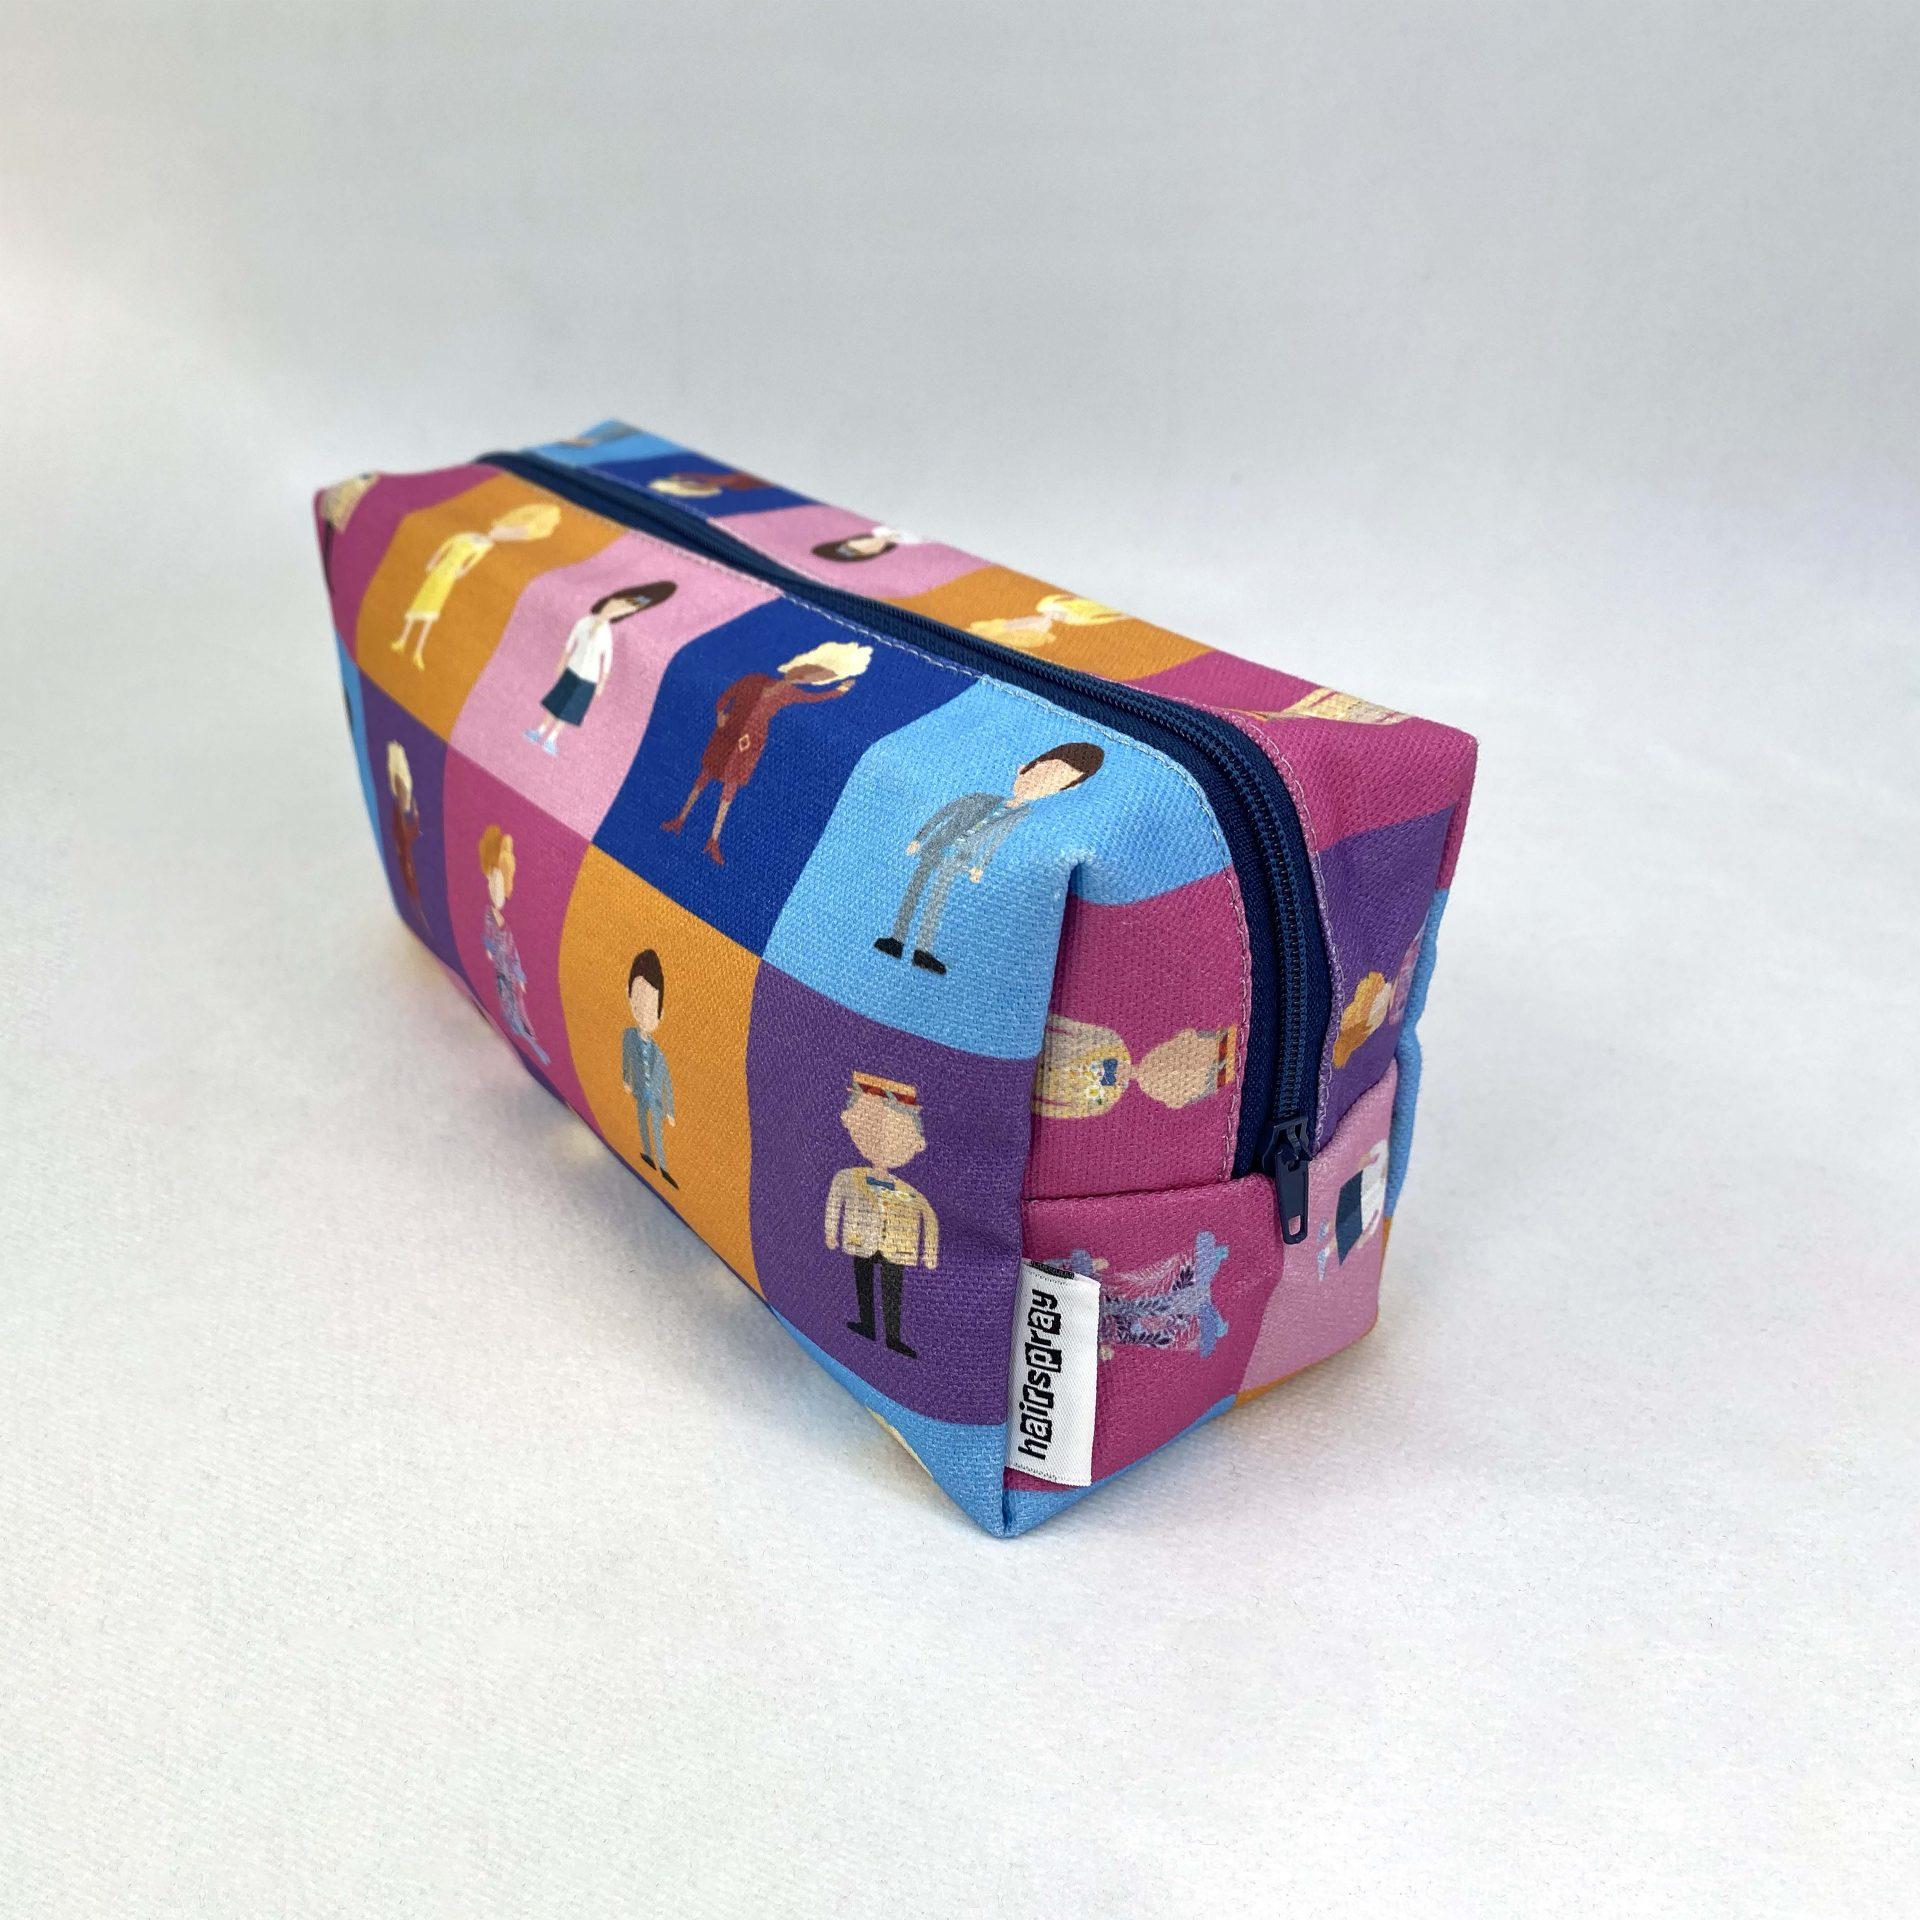 Printed Hairsoray cosmetic bag by Paul Bristows